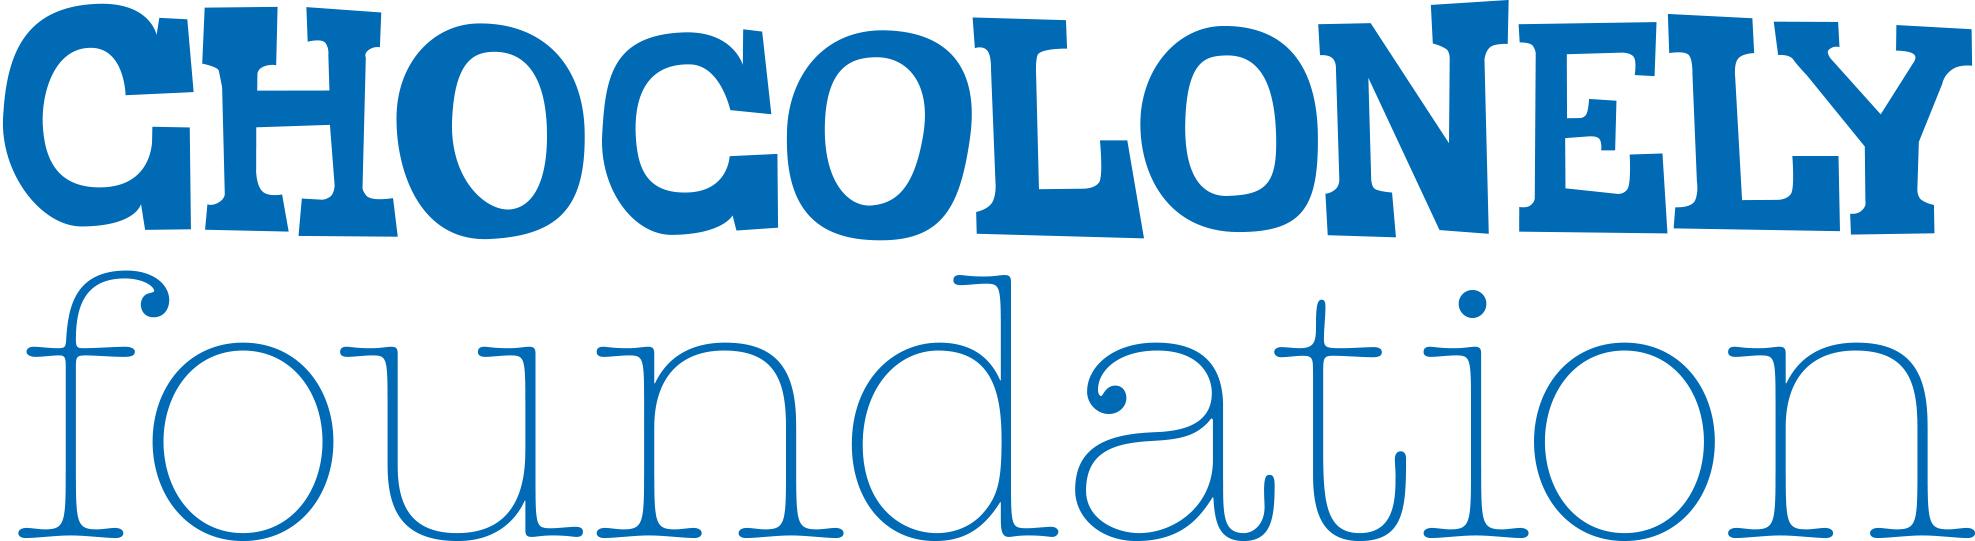 Chocolonely_foundation_logo_blauw3